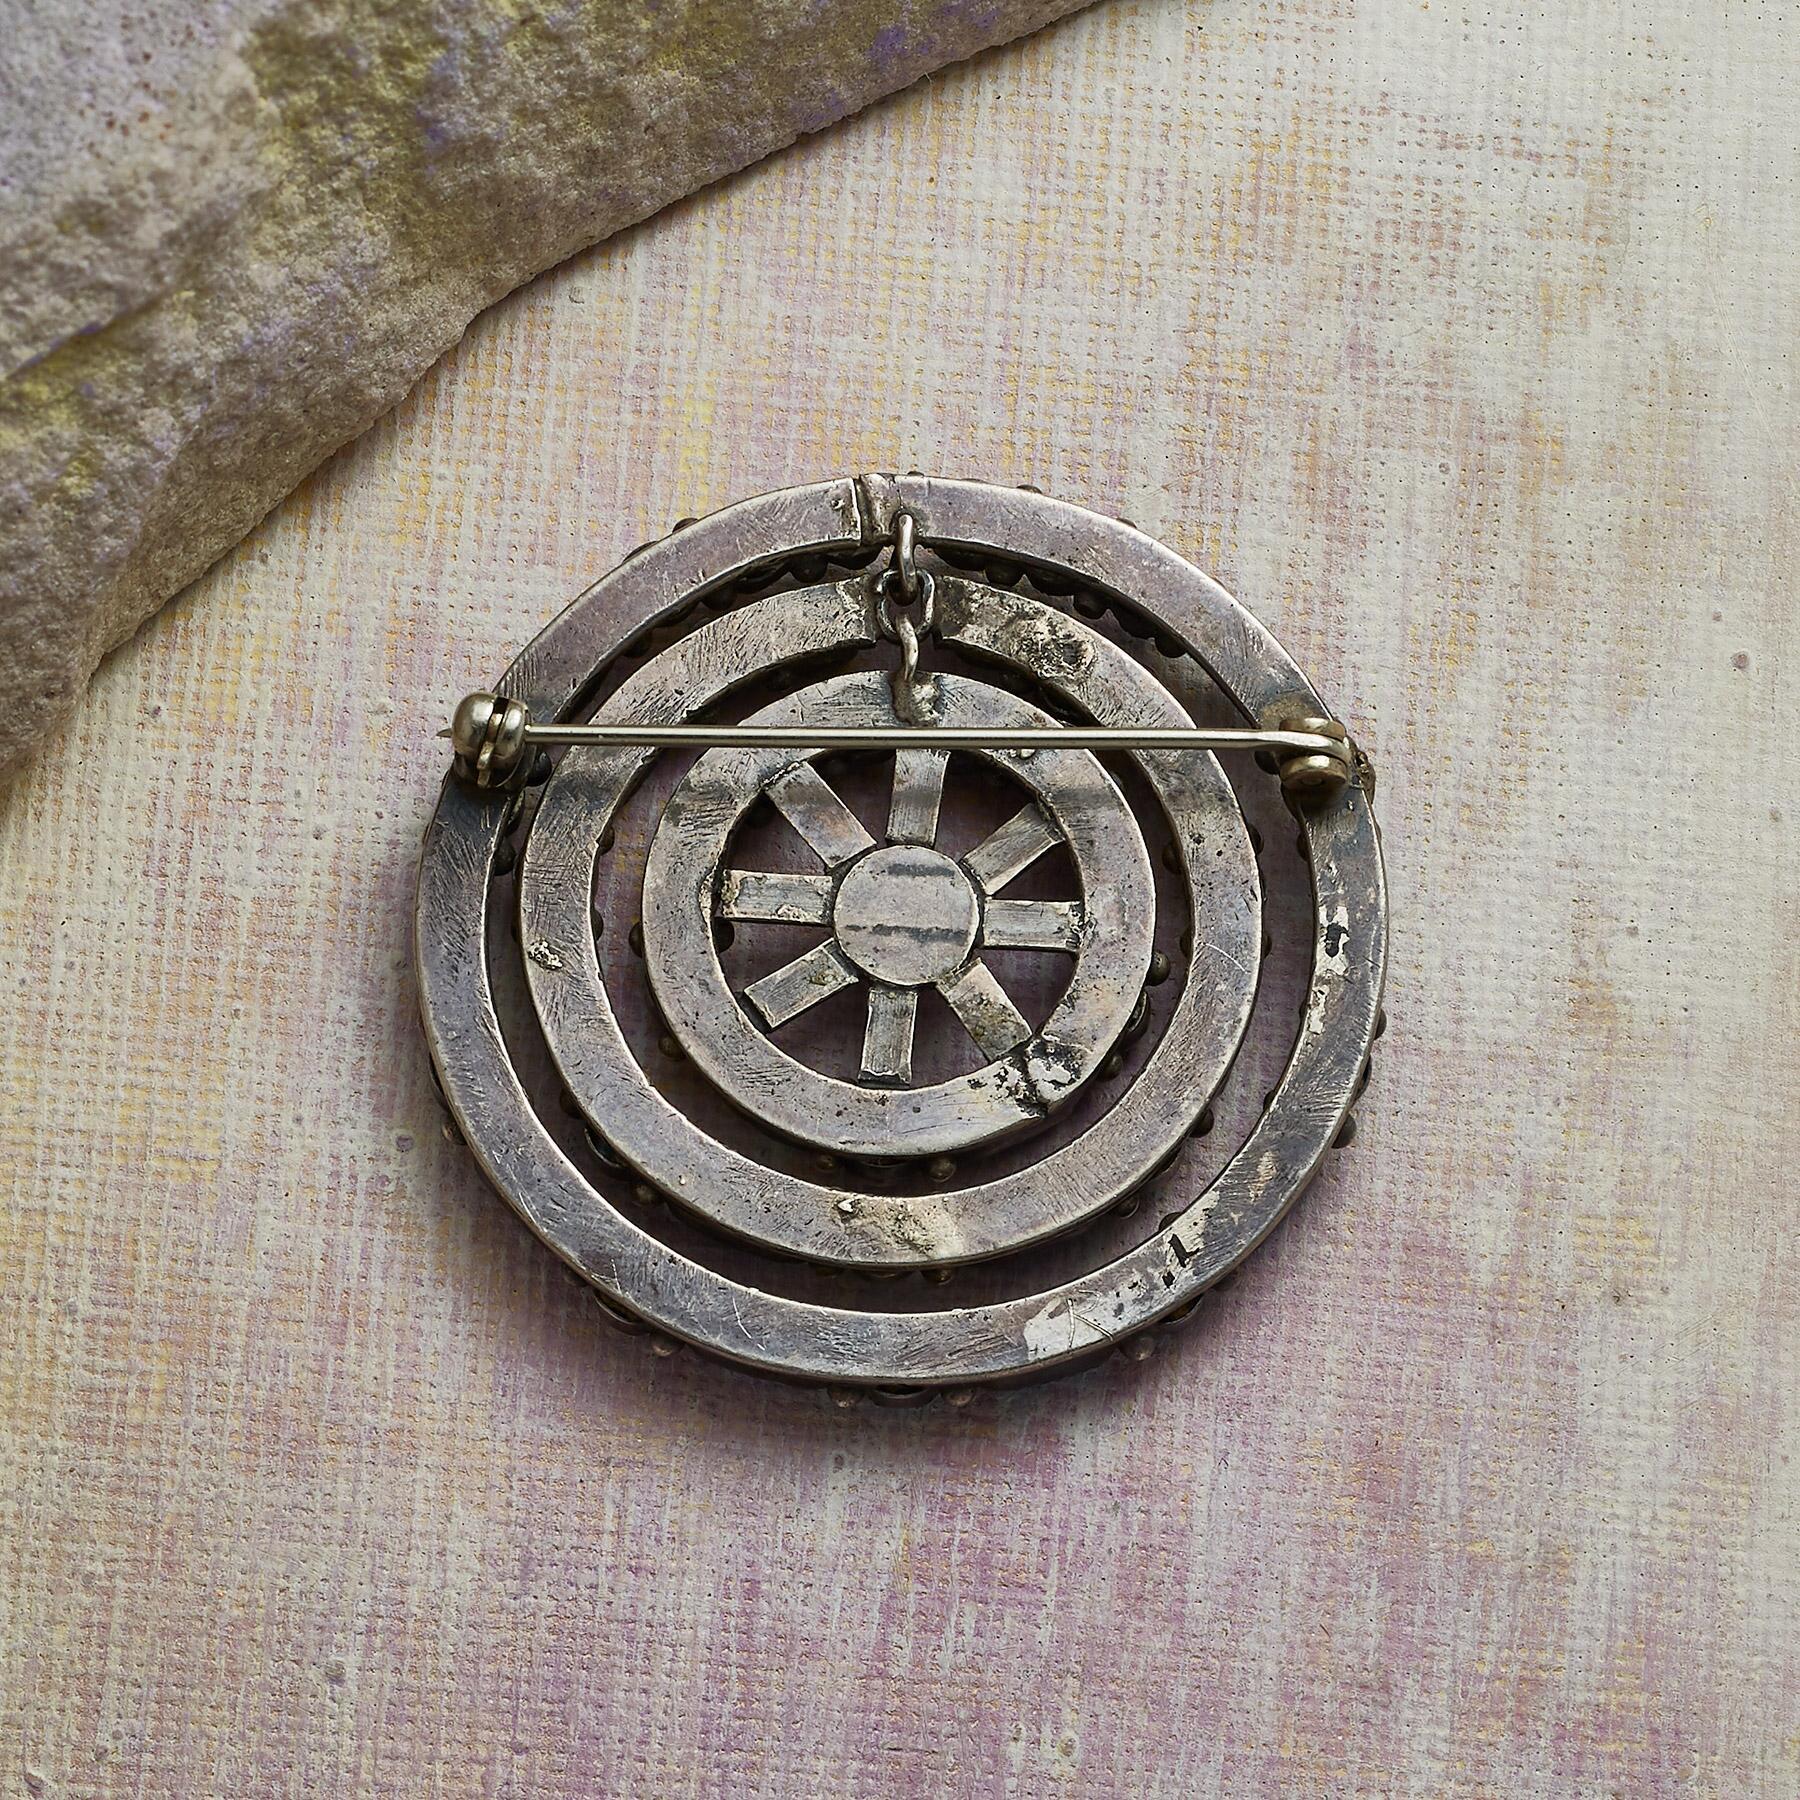 1960S ZUNI TURQUOISE PIN: View 2